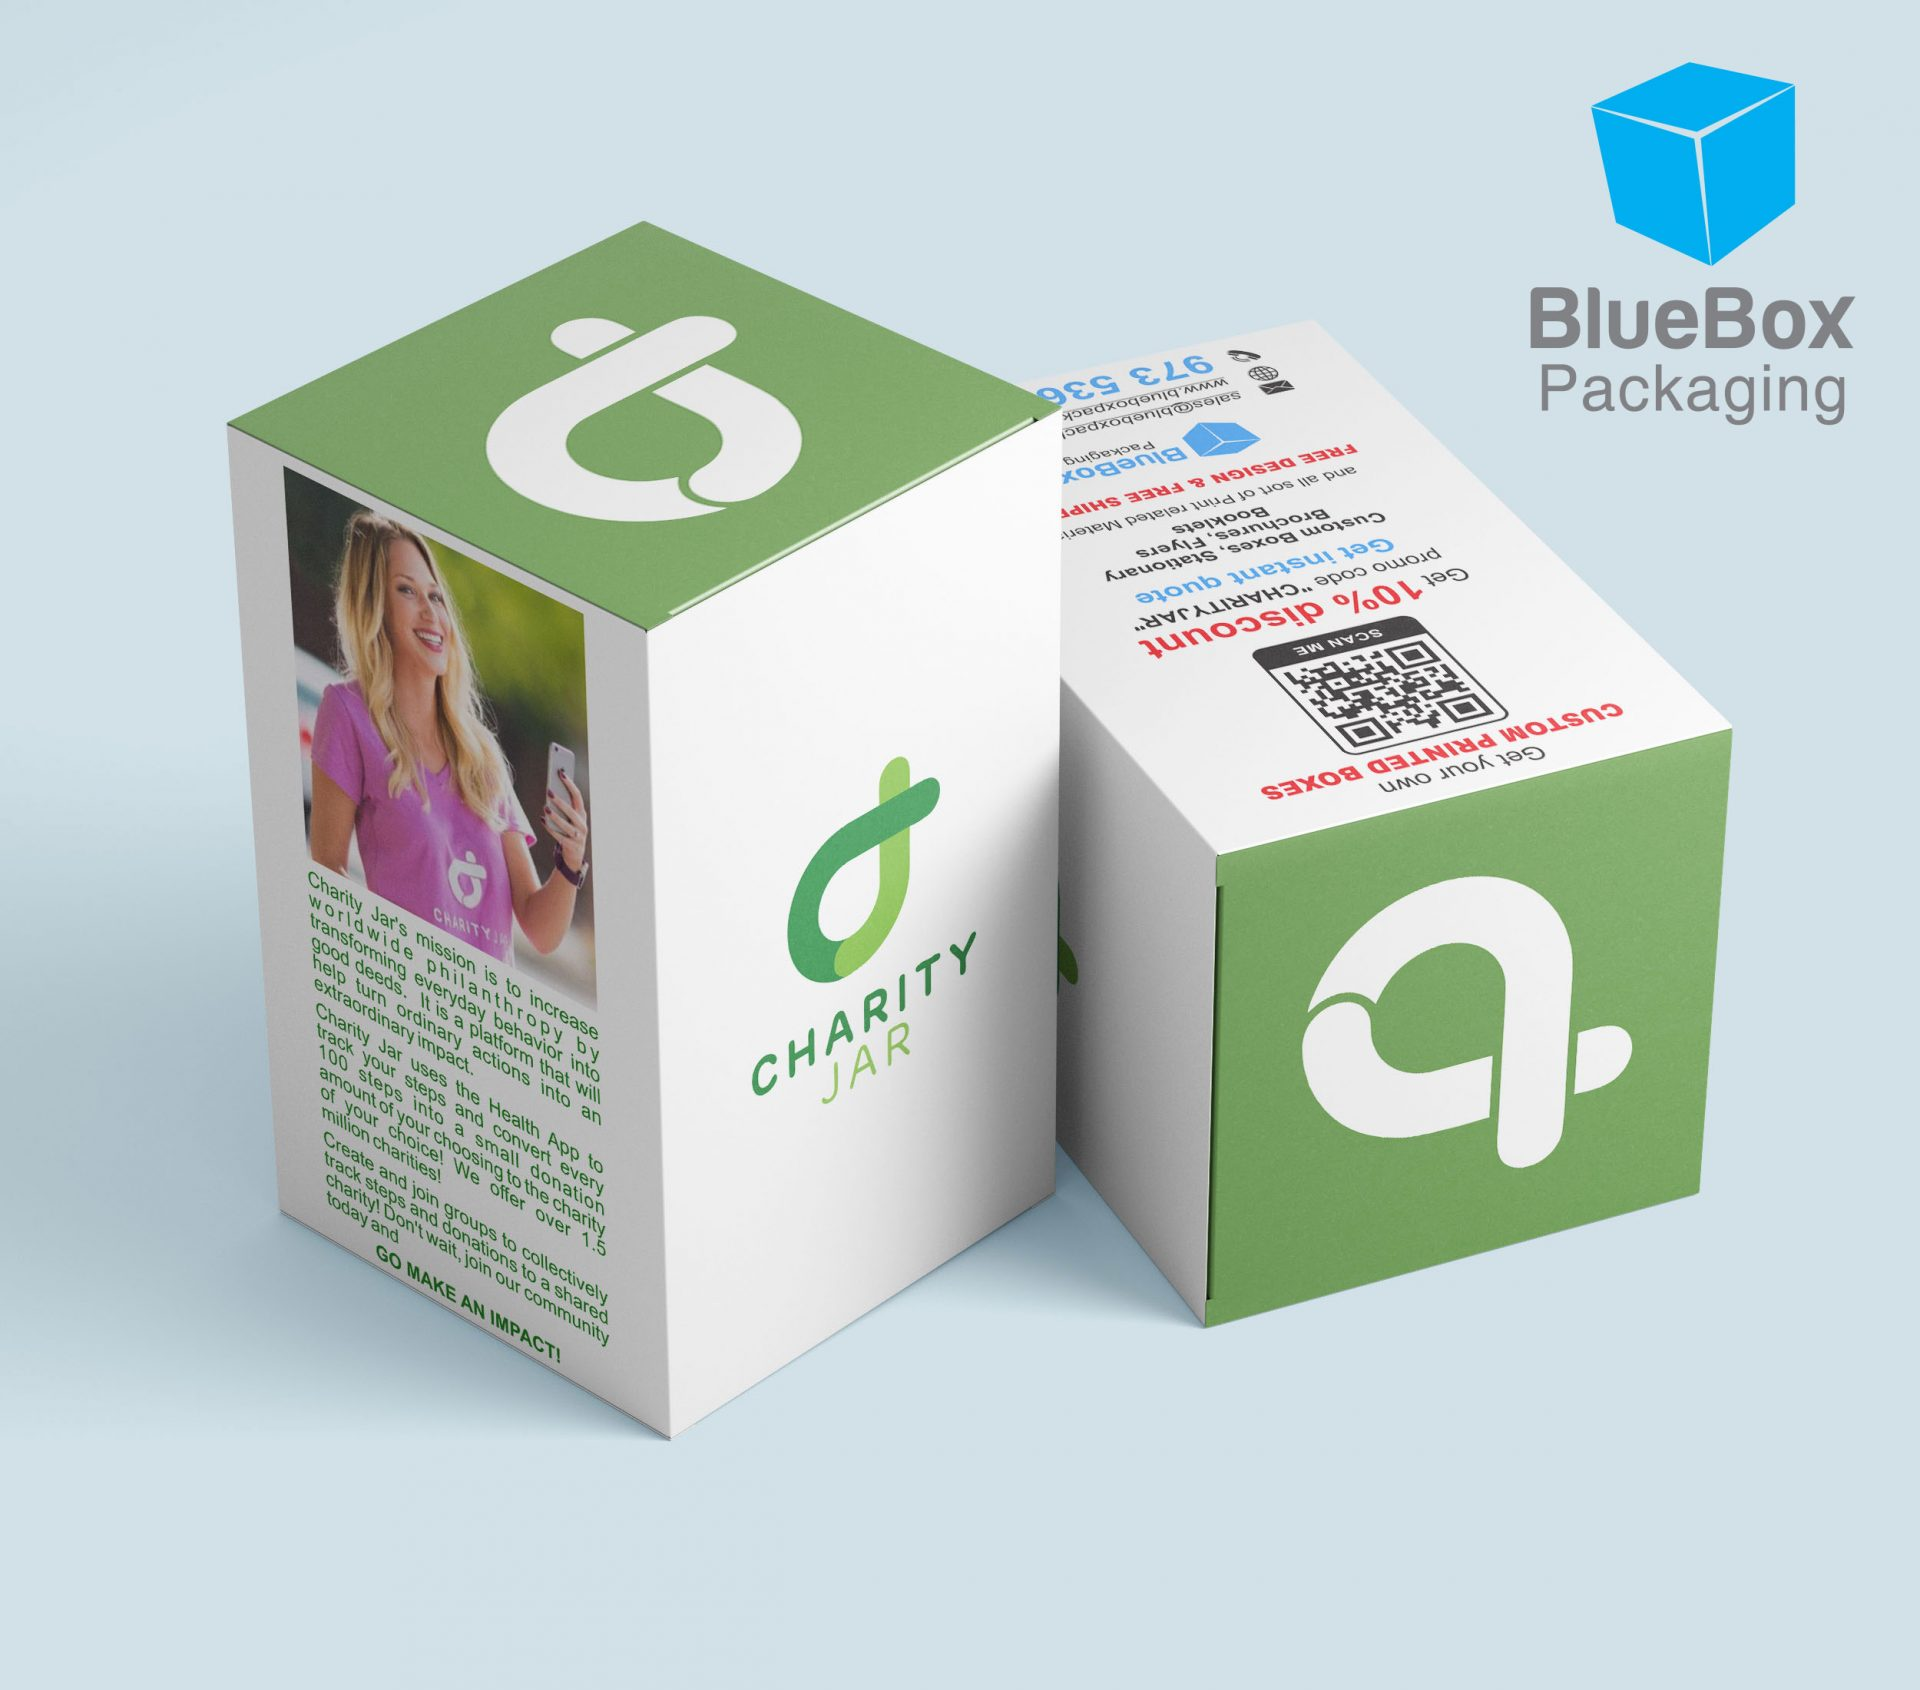 Blue box Packaging_Charityjar_MockUp_02